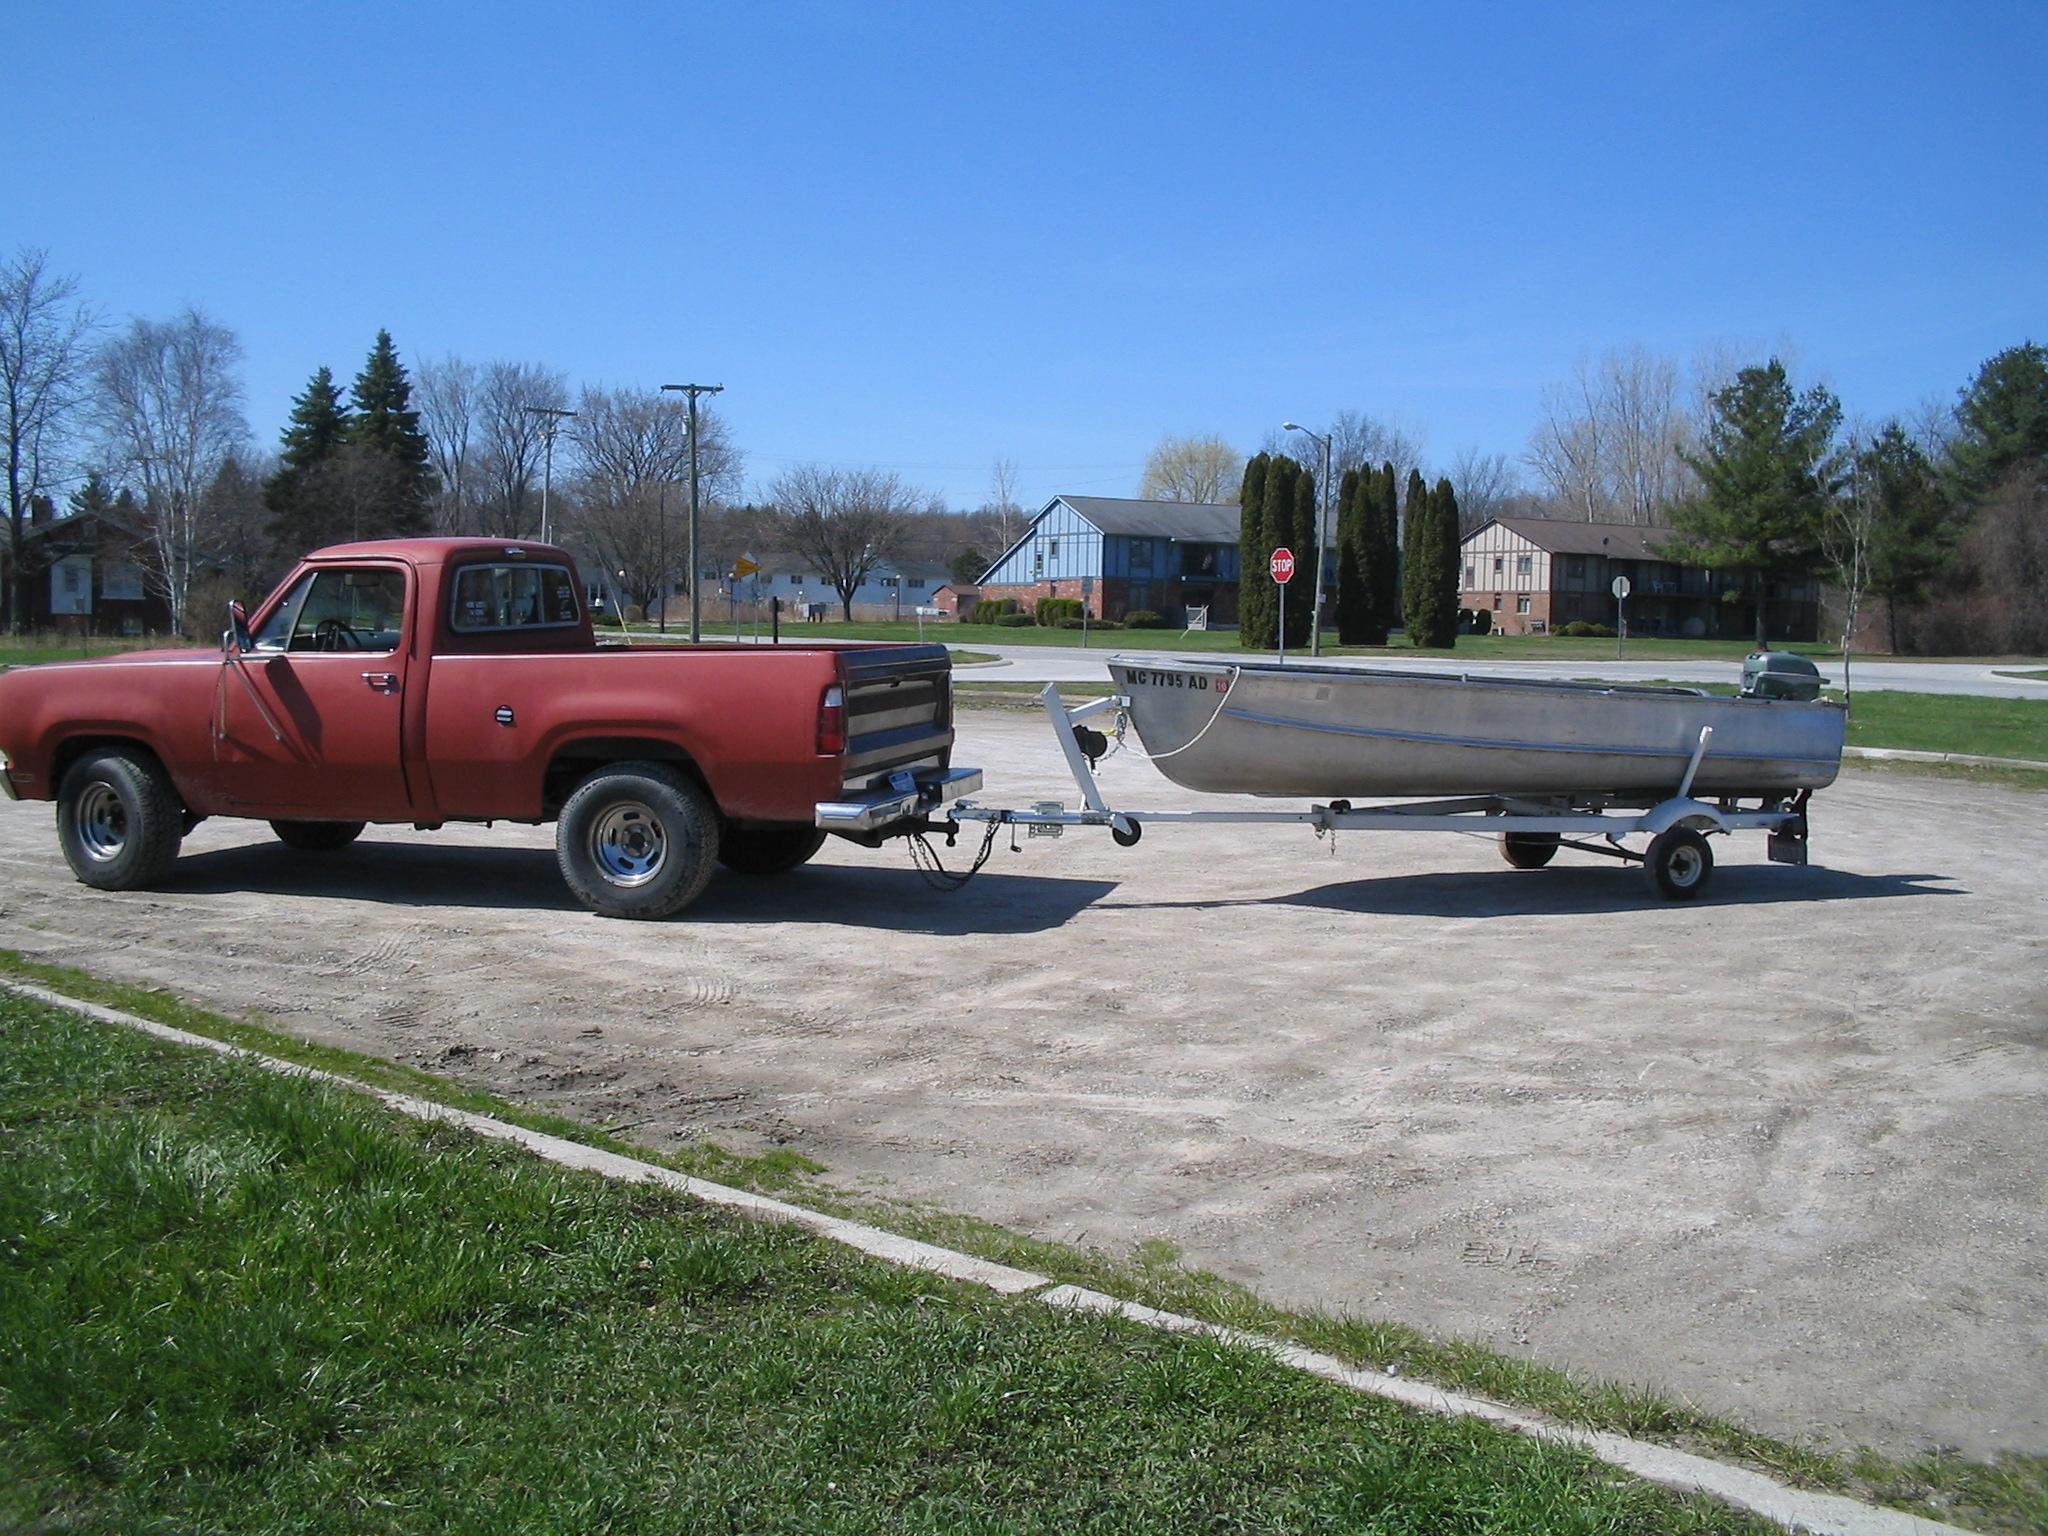 Craigslist Atlanta Boat Motors - impremedia.net